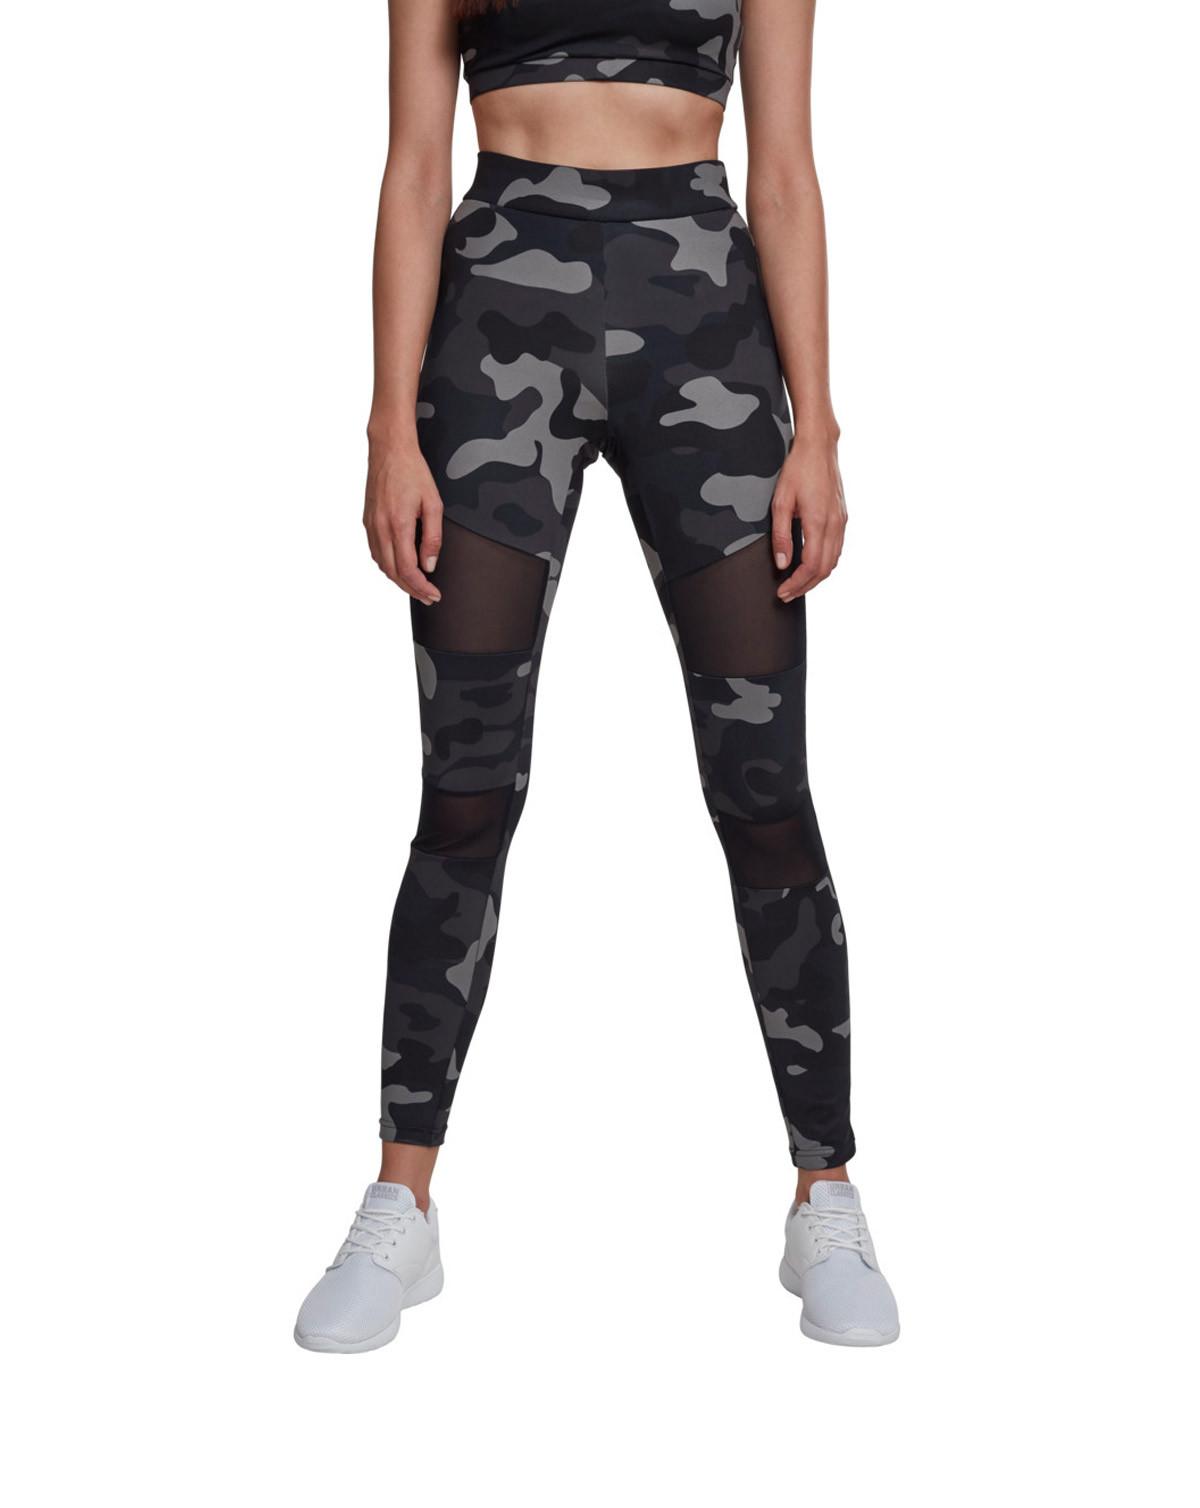 Image of   Urban Classics Camouflage Leggings m. Mesh (Dark Camo, 2XL)